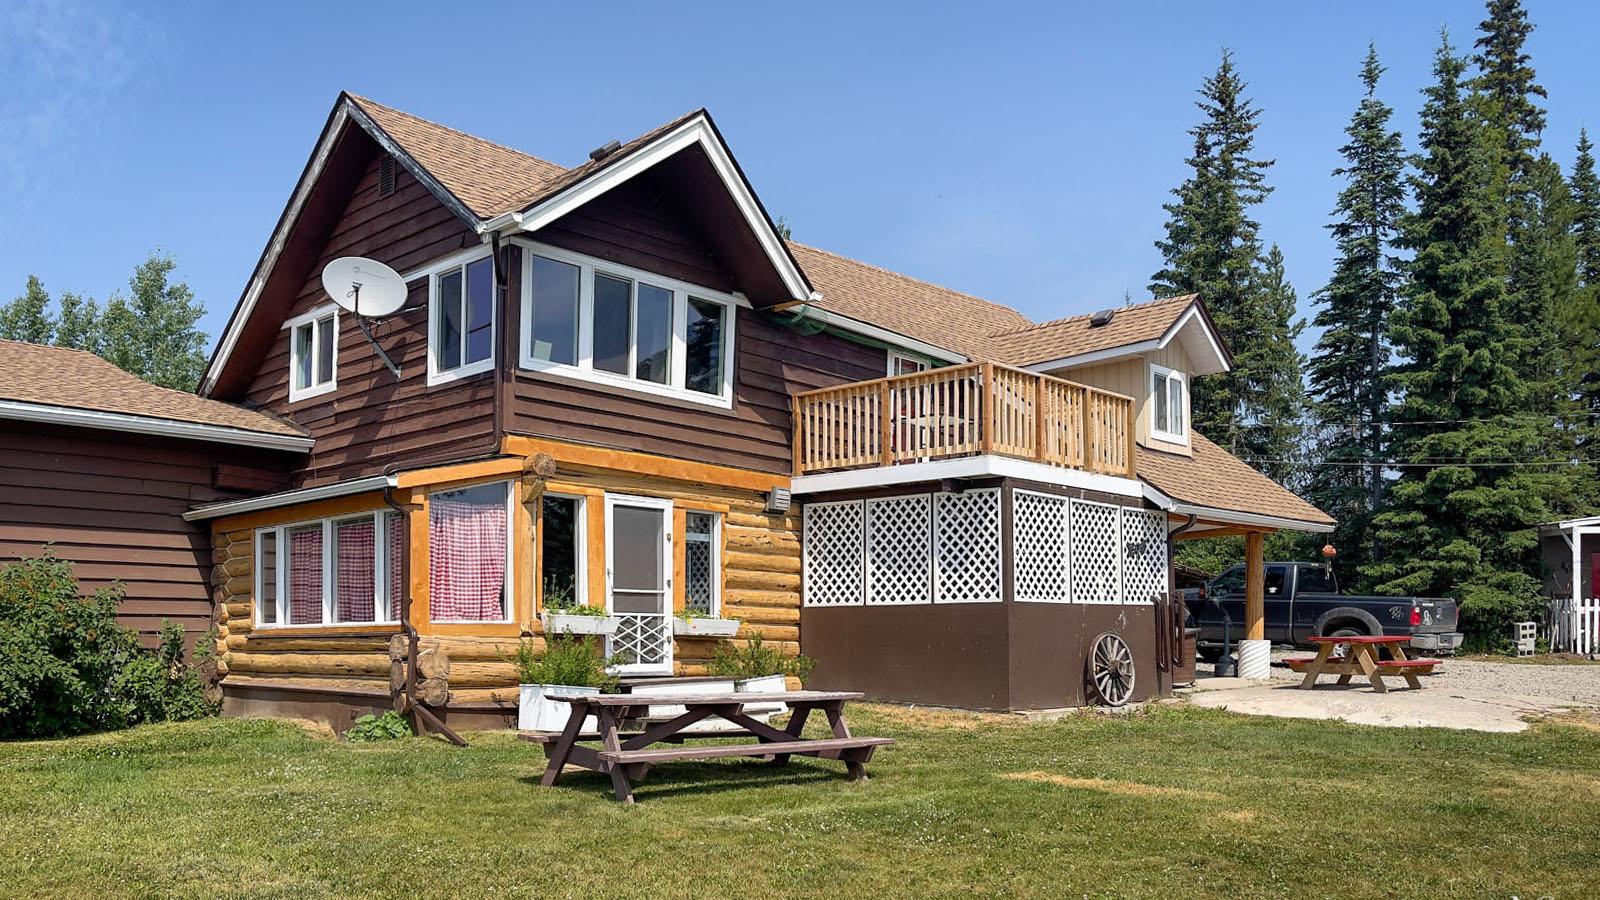 Meadowview lodge 15